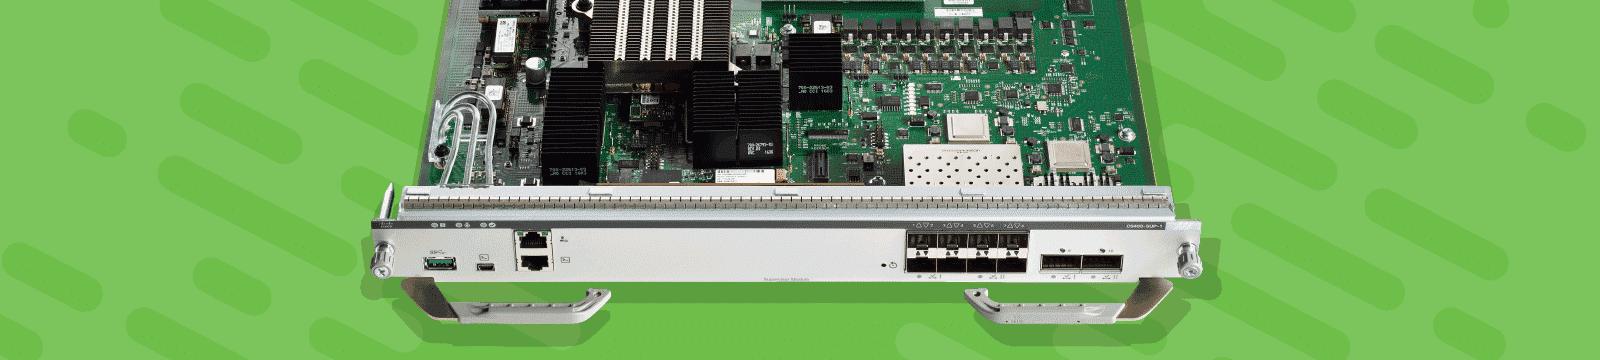 Scuola Vega Corso switch Cisco Catalyst 9000 ENC9k